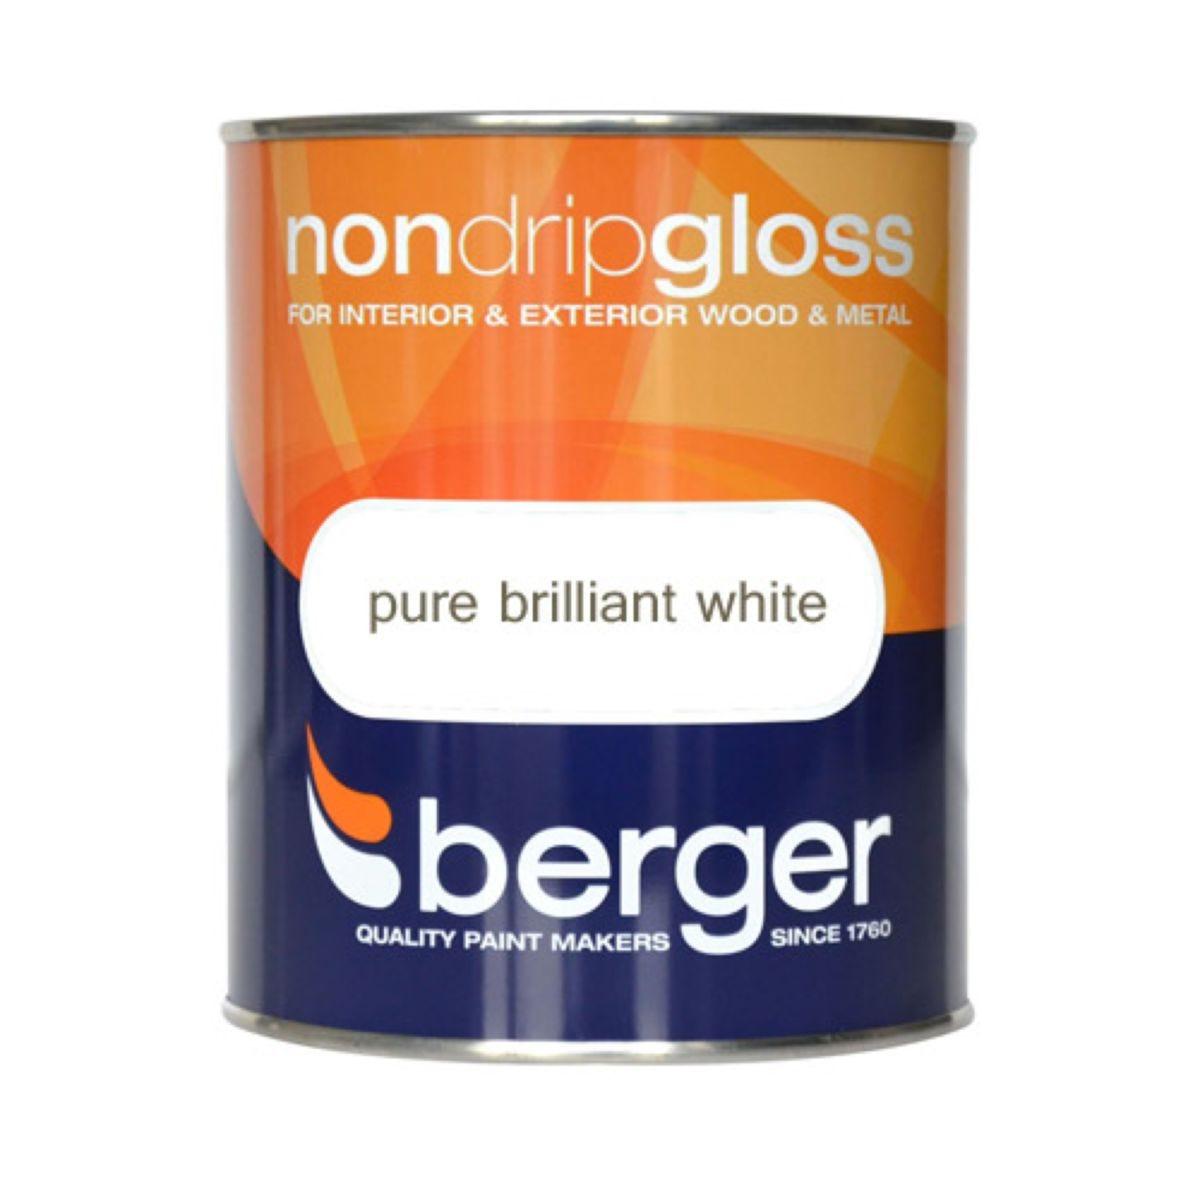 Berger Non-Drip Gloss Paint – White, 750ml